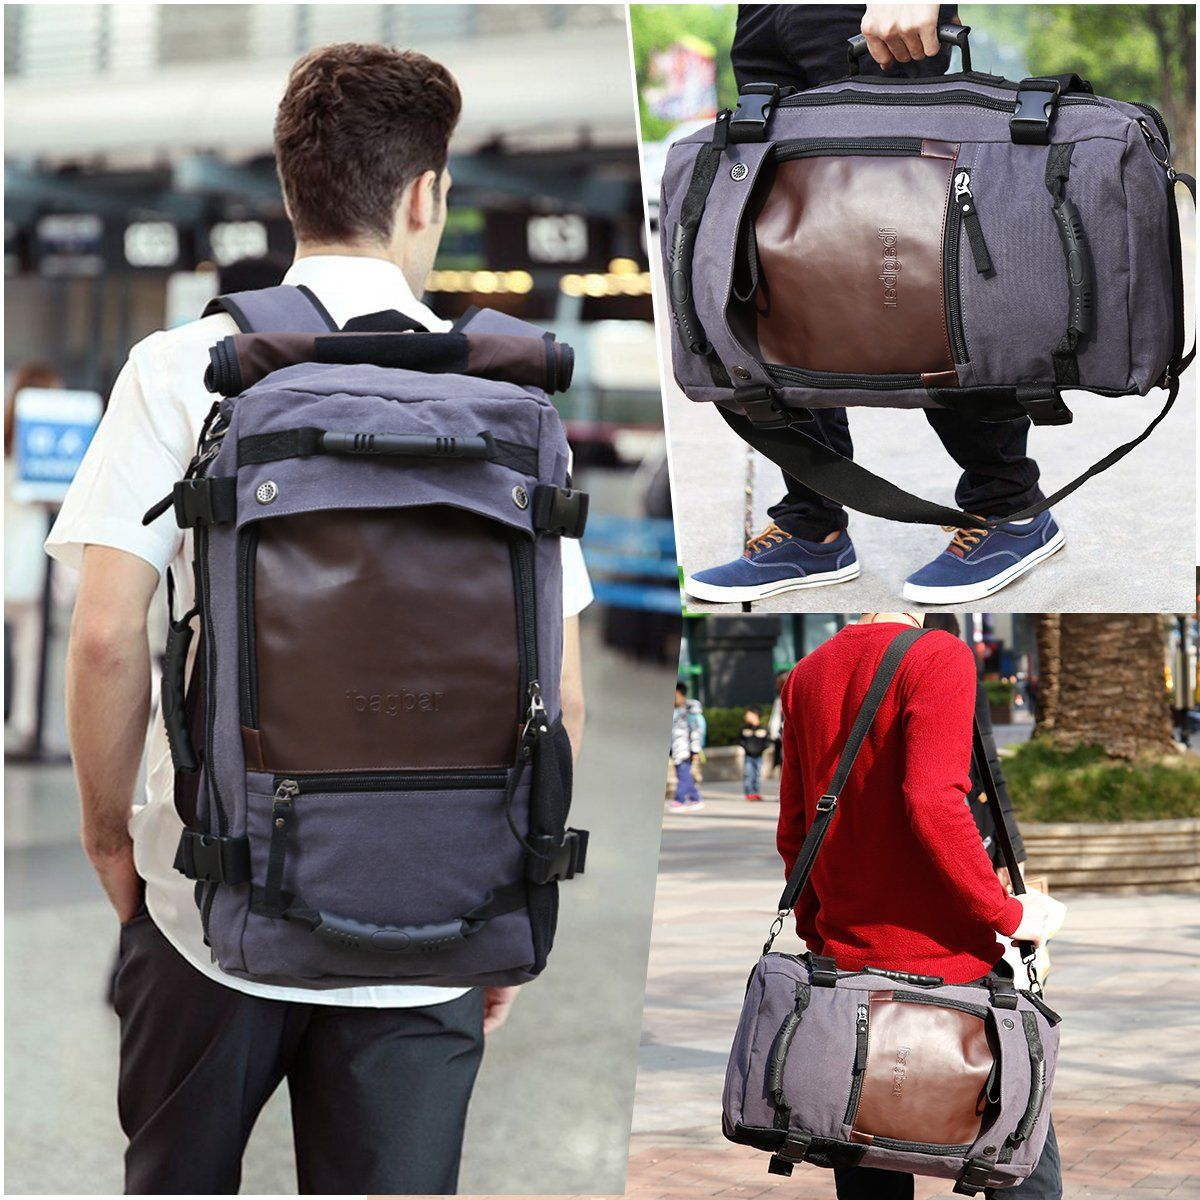 ibagbar Canvas Backpack Travel Bag Hiking Bag Camping Bag